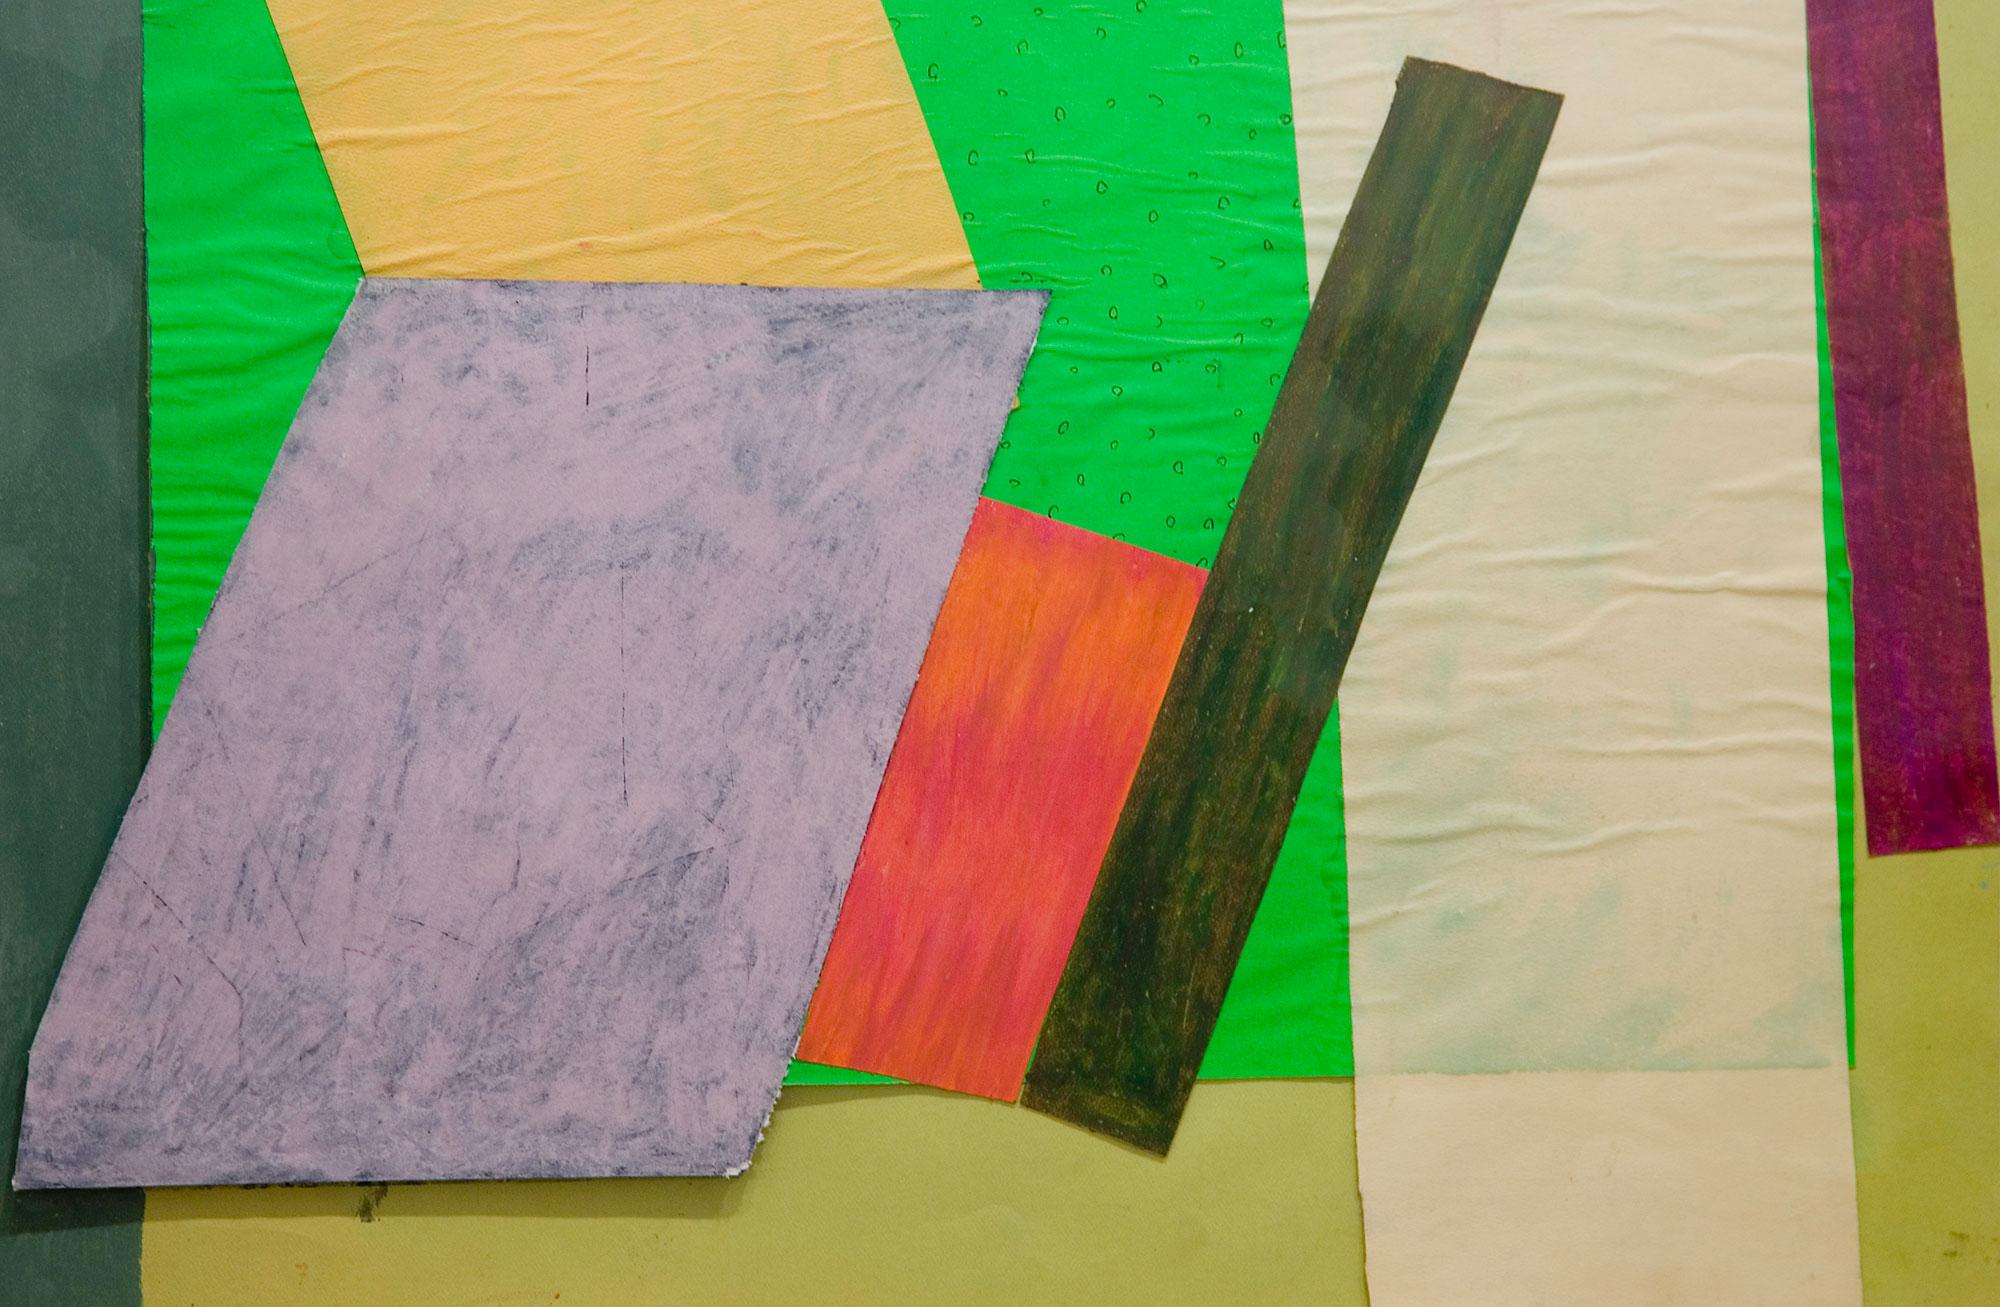 Jessica Stockholder (2011) - Underpinning